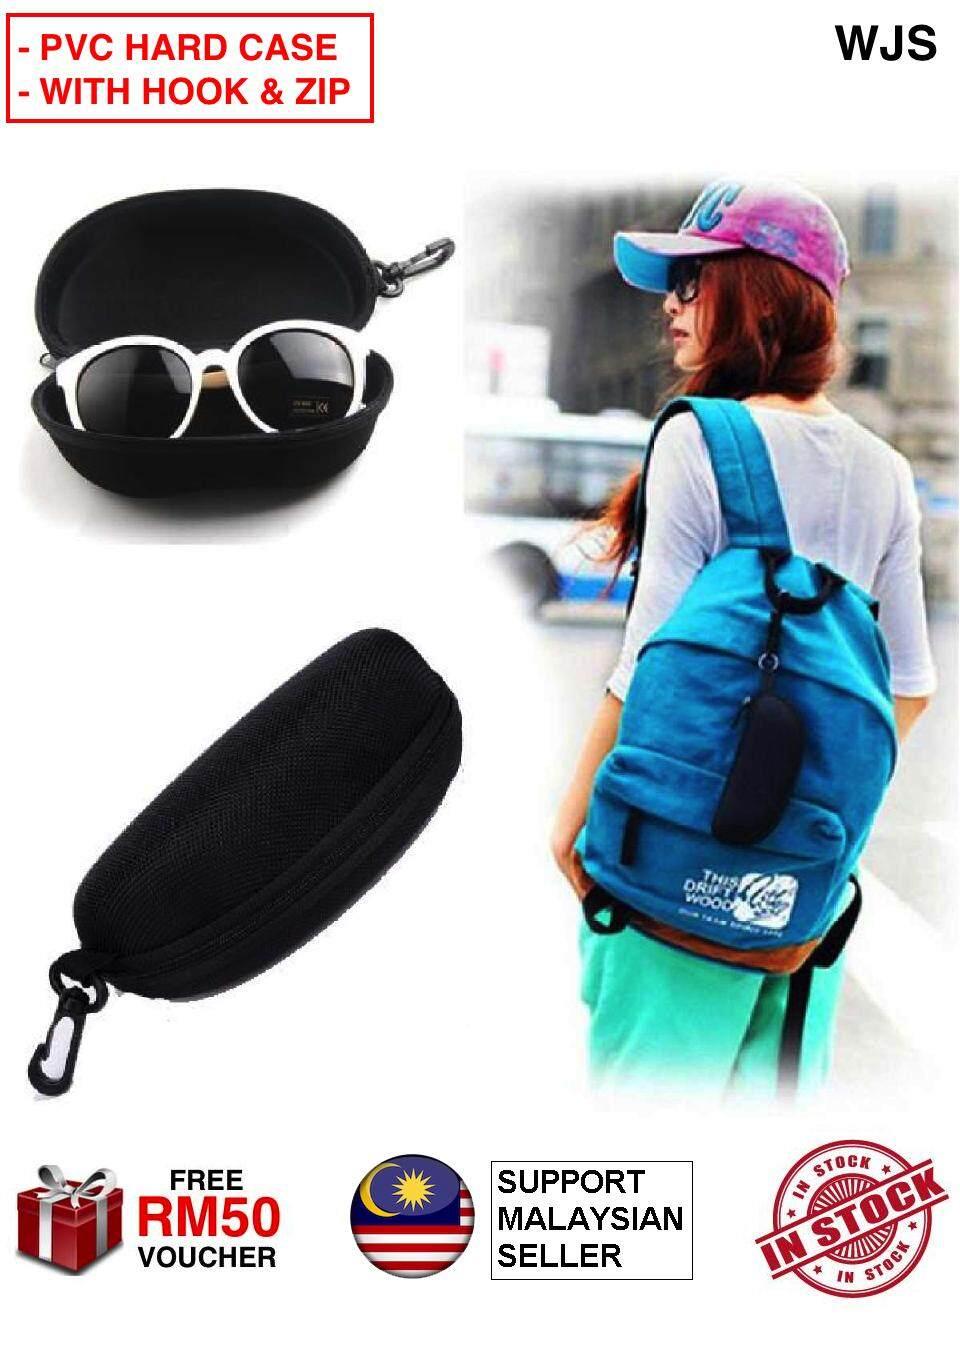 (HARD PVC - WITH HOOK & ZIP) WJS Hard PVC Zipper Sunglass Casing Spectacle Case Eyewear Case Sunglasses Hard Case Box Outdoor Protector Black Holder Storage BLACK [FREE RM50 VOUCHER]